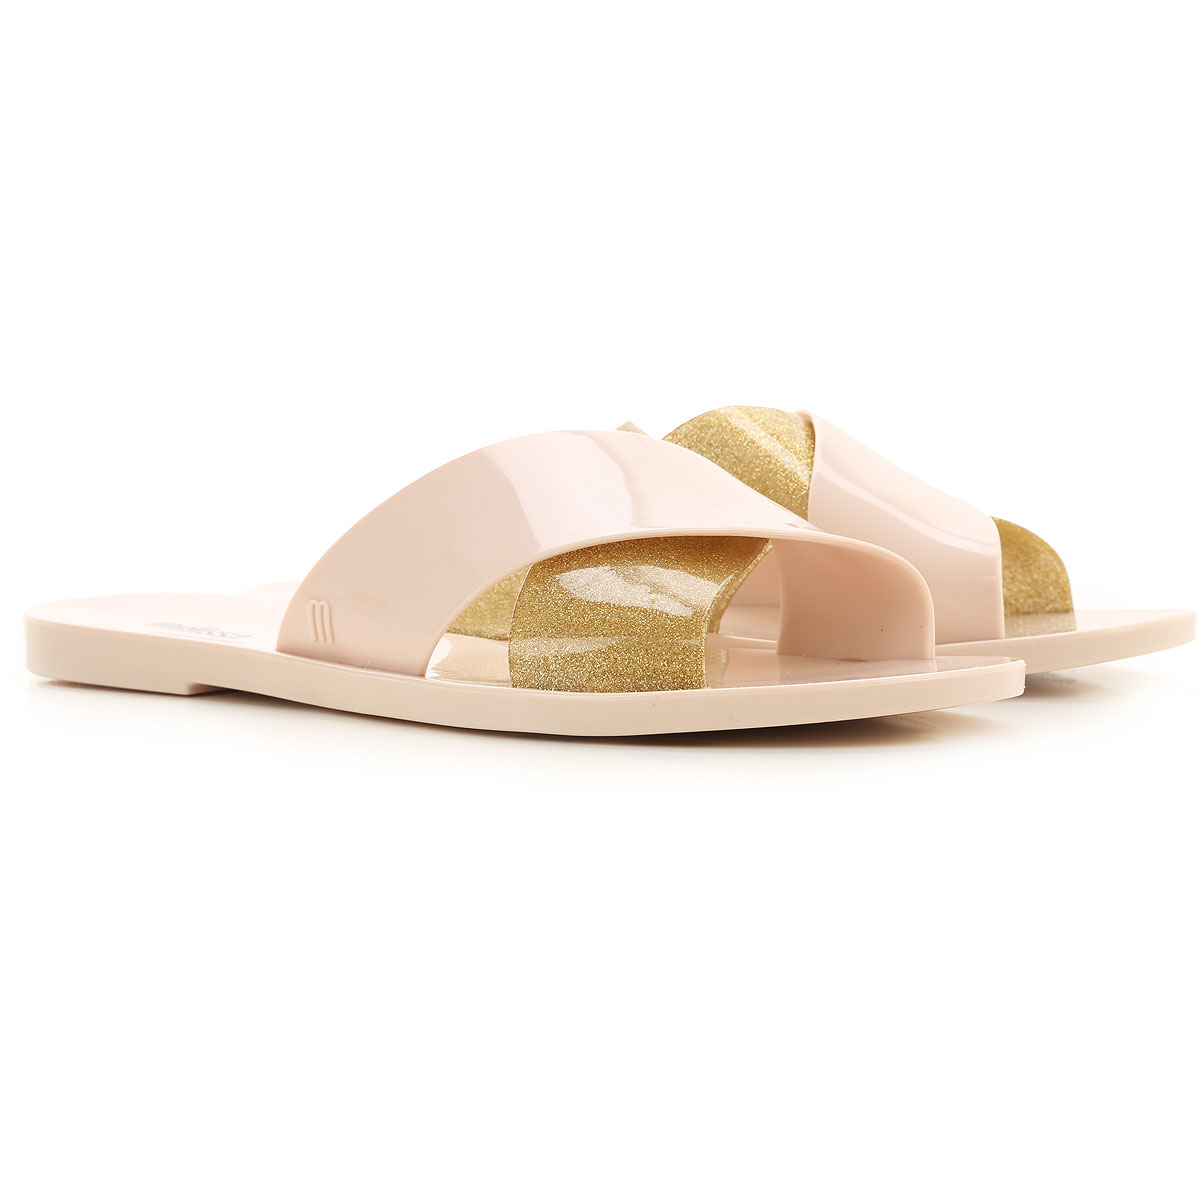 Melissa Sandals for Women On Sale, Beige, PVC, 2019, USA 5 - EUR 35/36 USA 6 - EUR 37 USA 7 - EUR 38 USA 8 - EUR 39 USA 9 - EUR 40 USA 10 - EUR 41/42